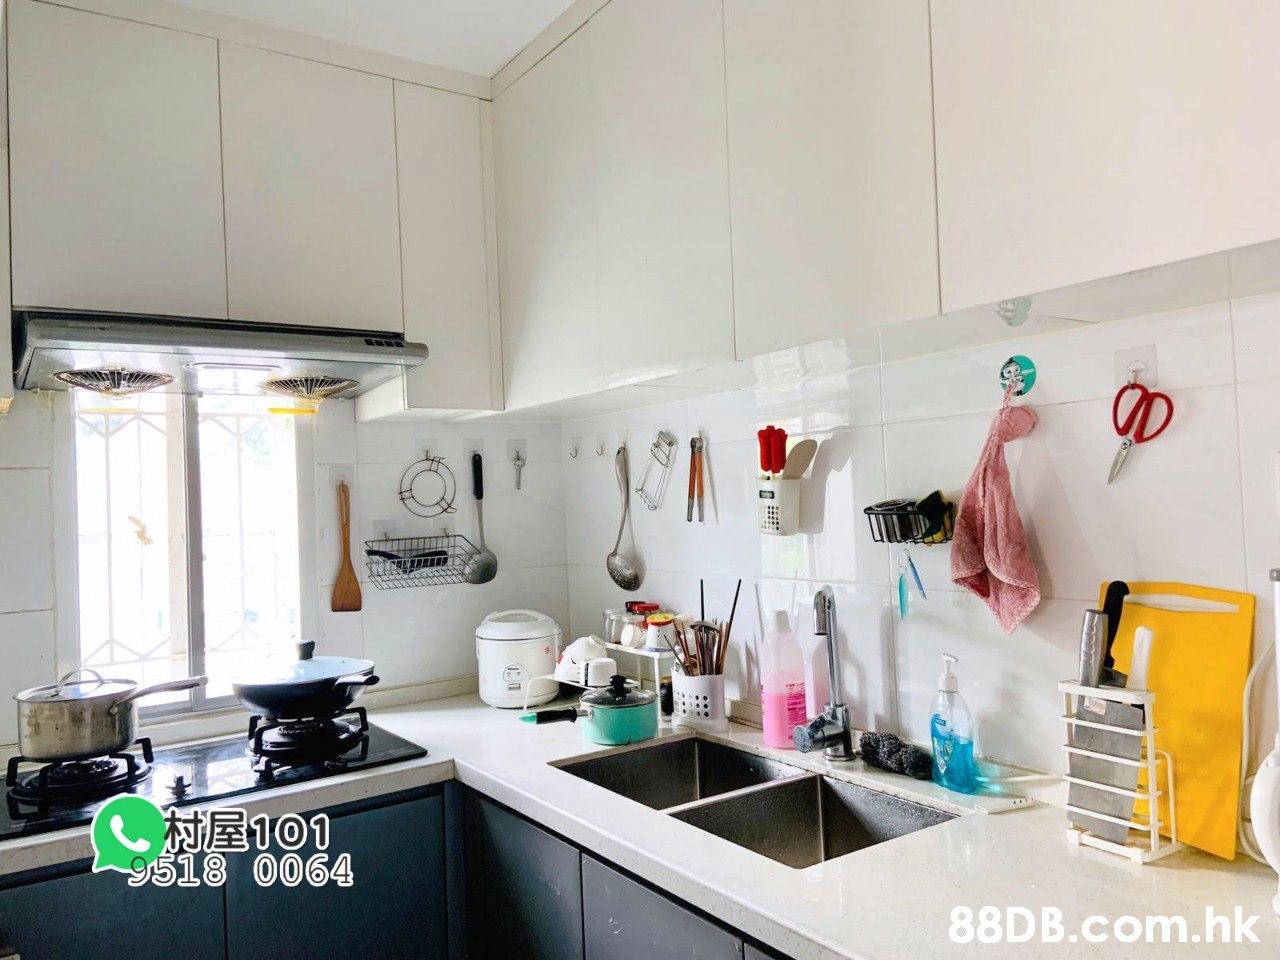 101 9518 0064 .hk  Room,Property,Interior design,Turquoise,Furniture